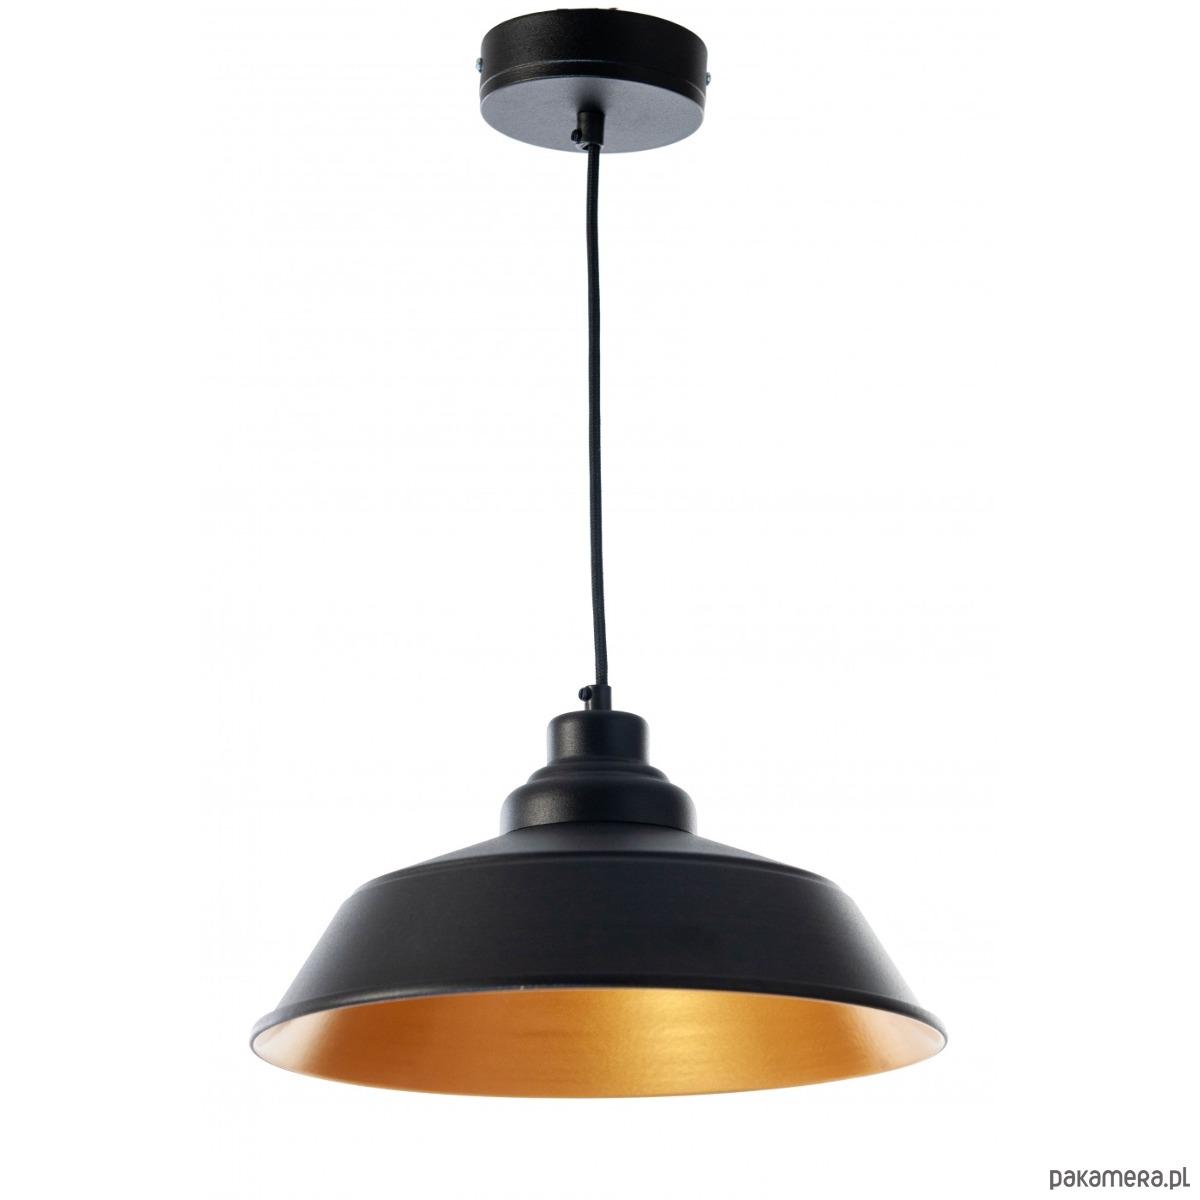 Lampa wisząca Gold Black Loft, czarna, 115 cm